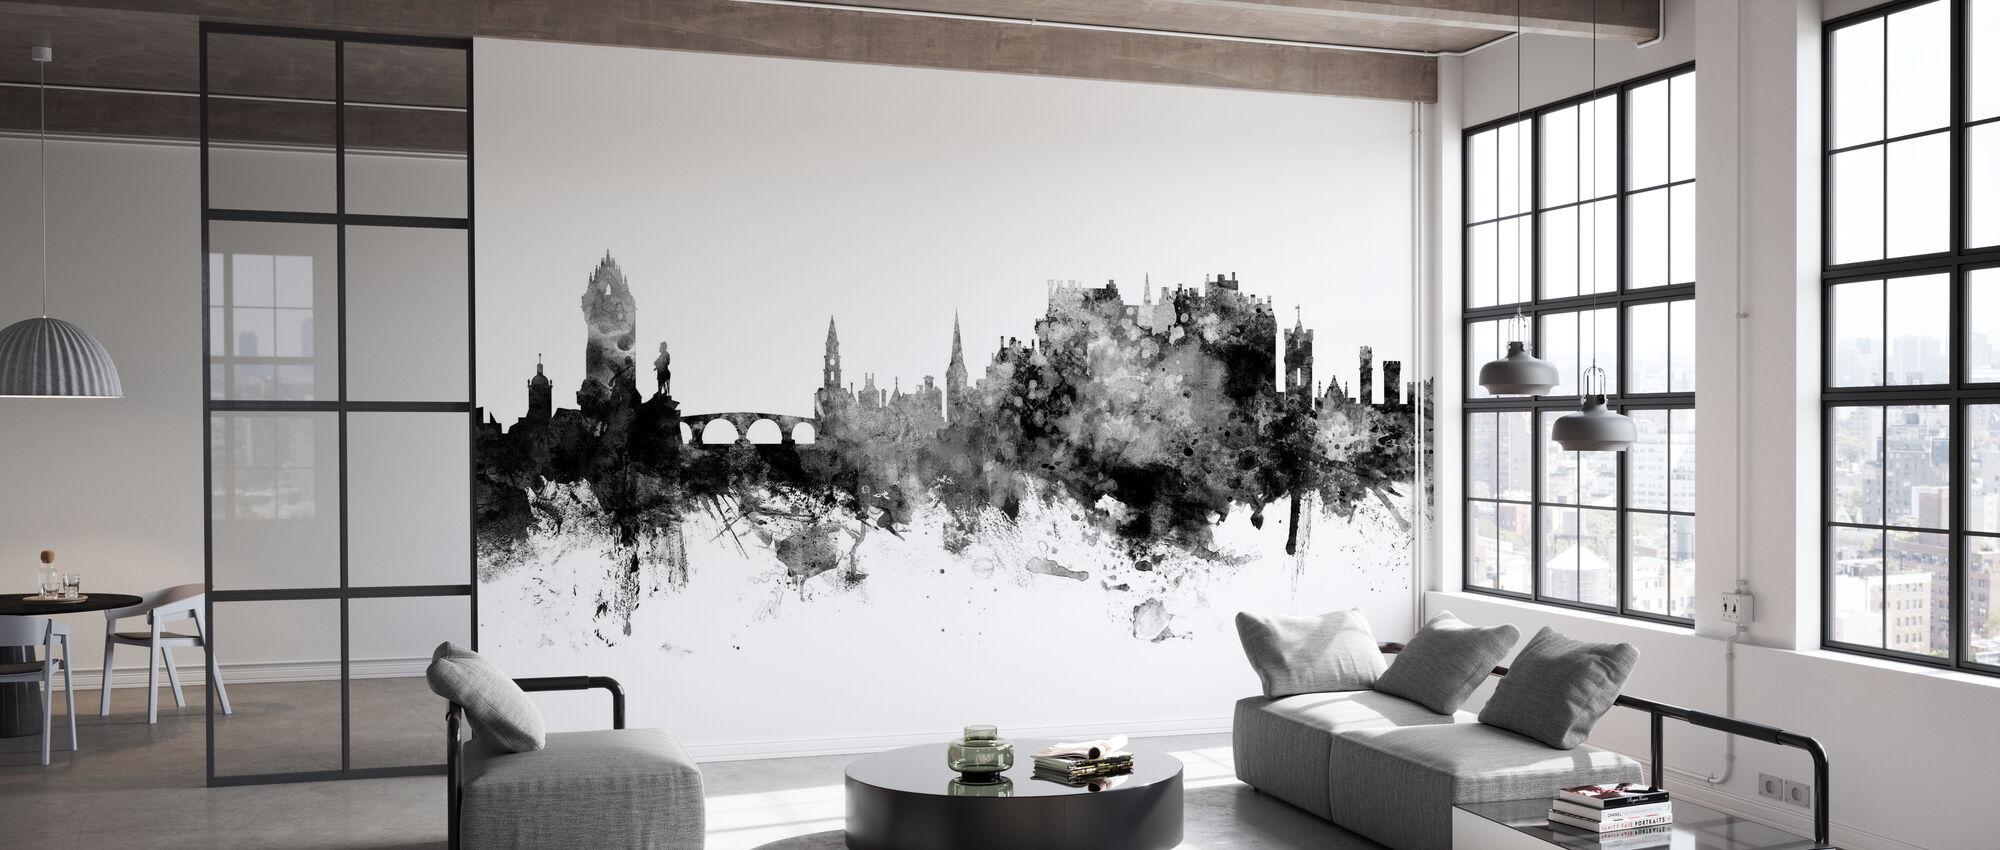 Stirling Scotland Skyline - Wallpaper - Office